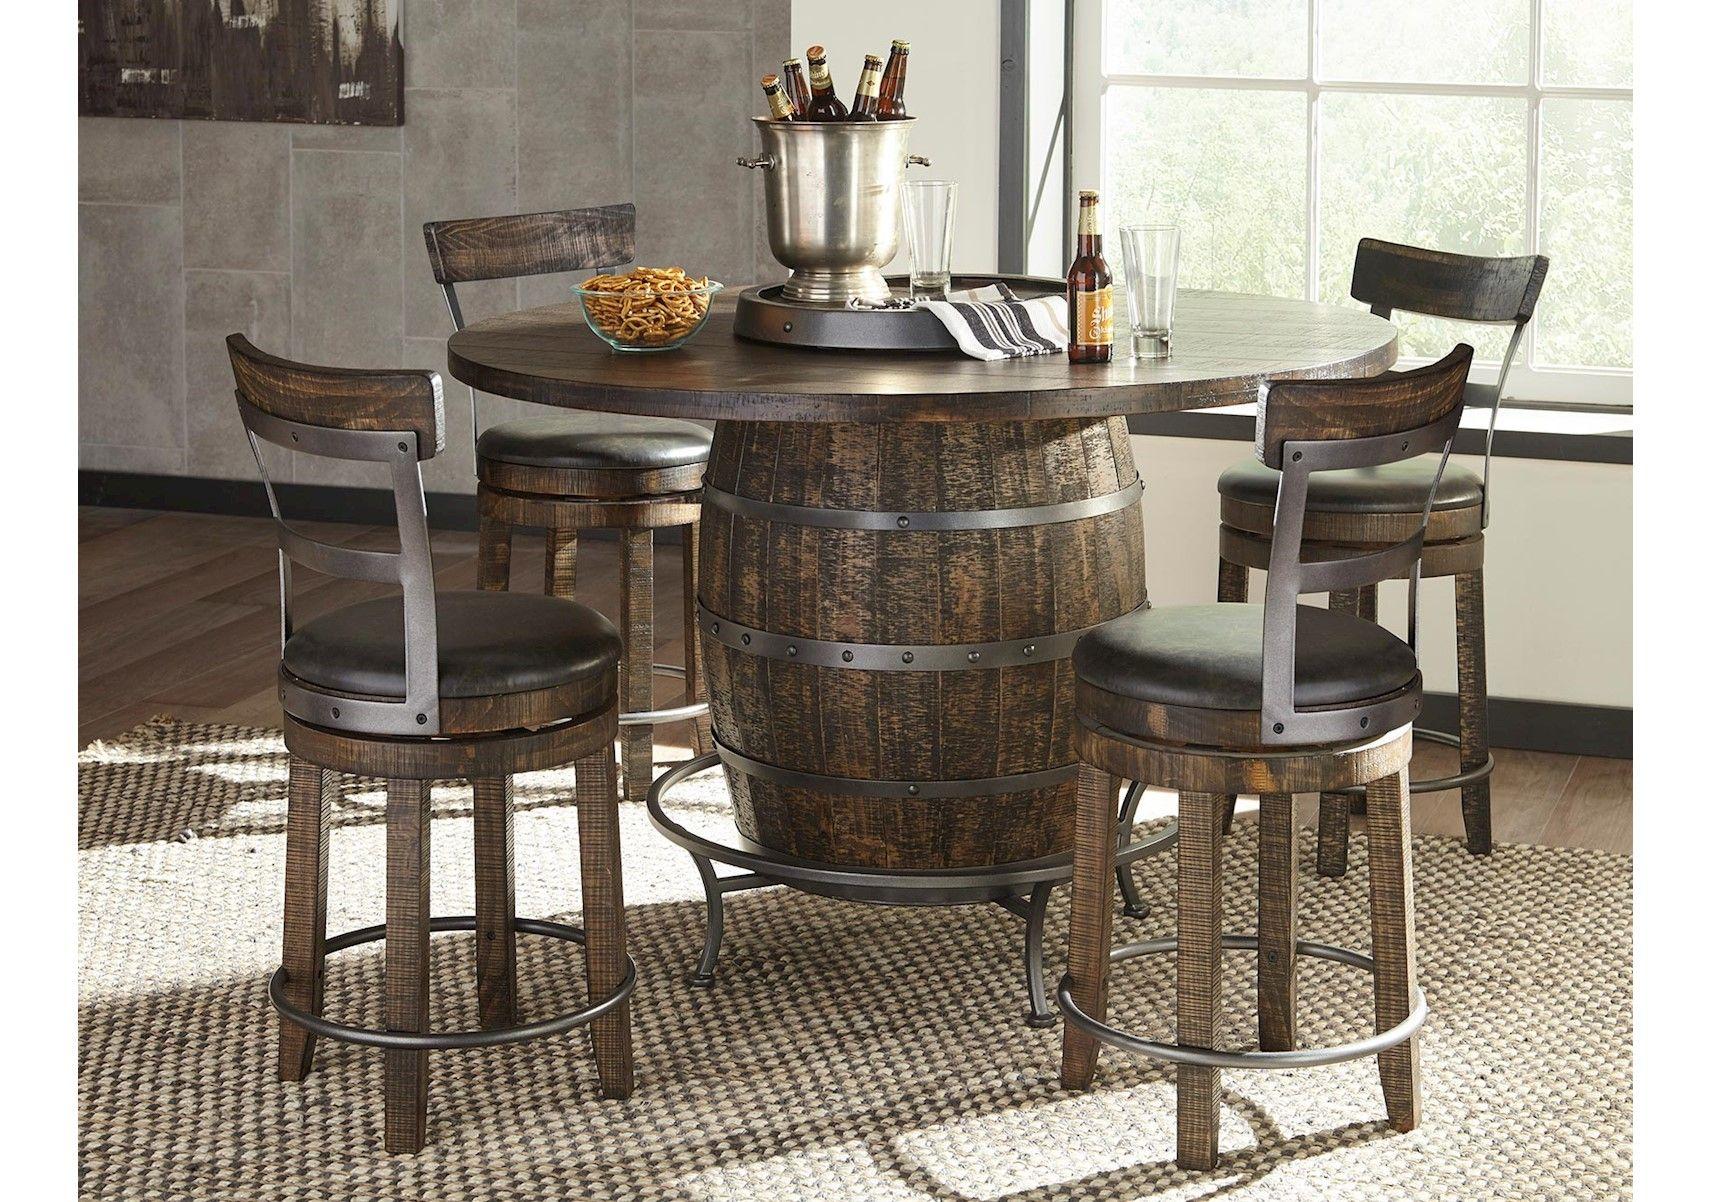 Lacks Homestead 5 Pc Dining Set Pub Table Sets Round Pub